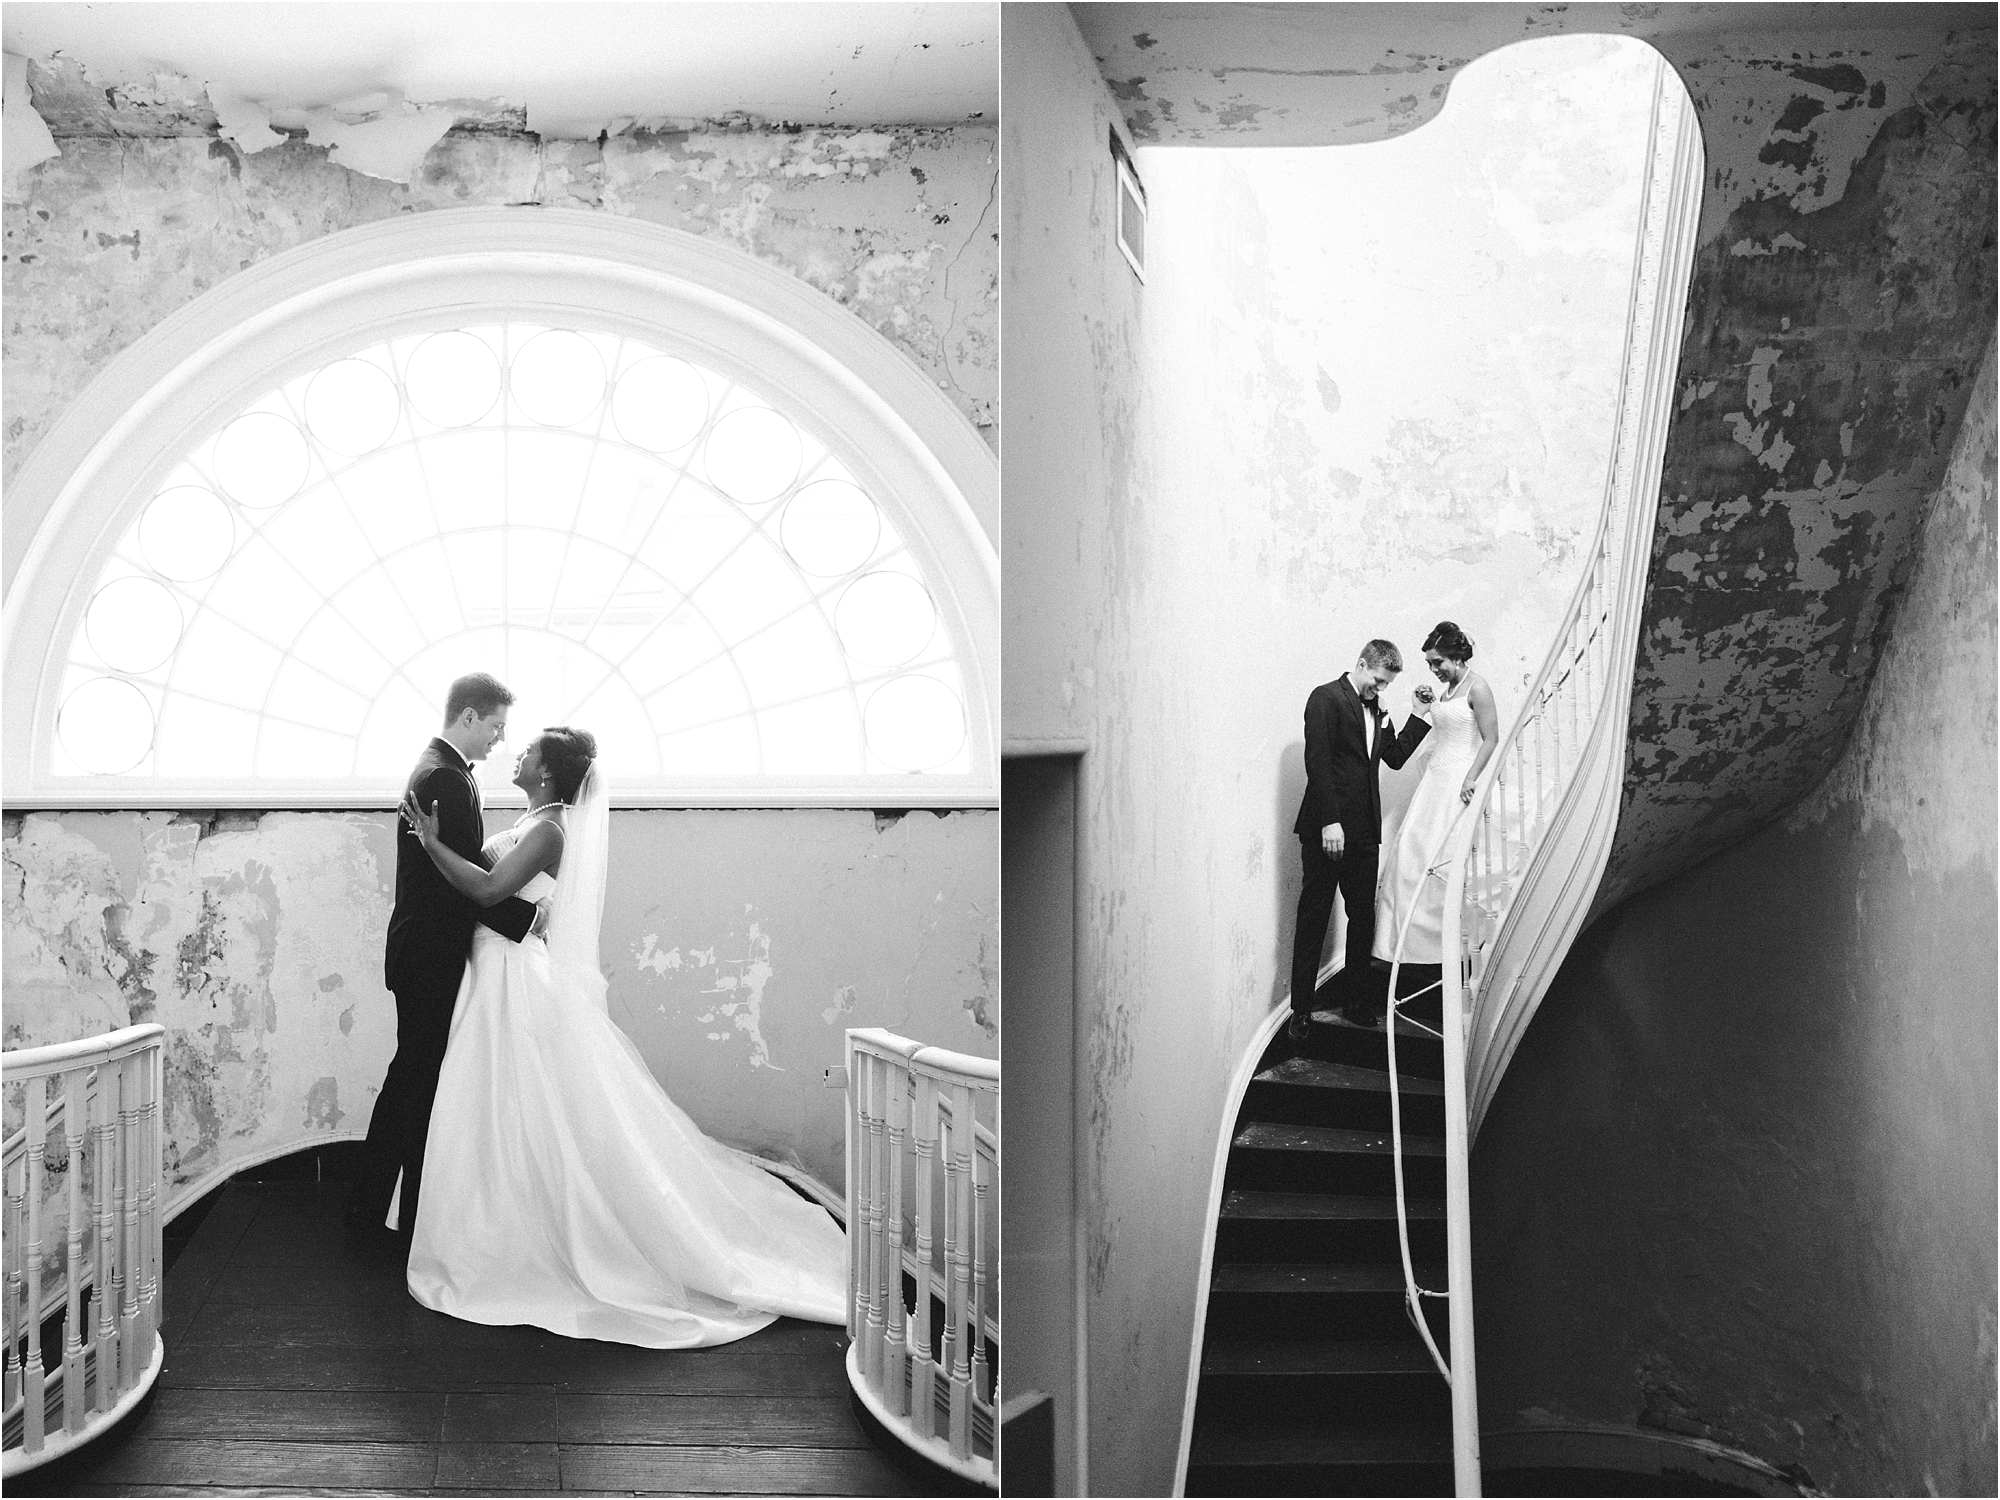 stephanie-yonce-photography-historic-church-virginia-museu-fine-arts-wedding-photos_030.JPG